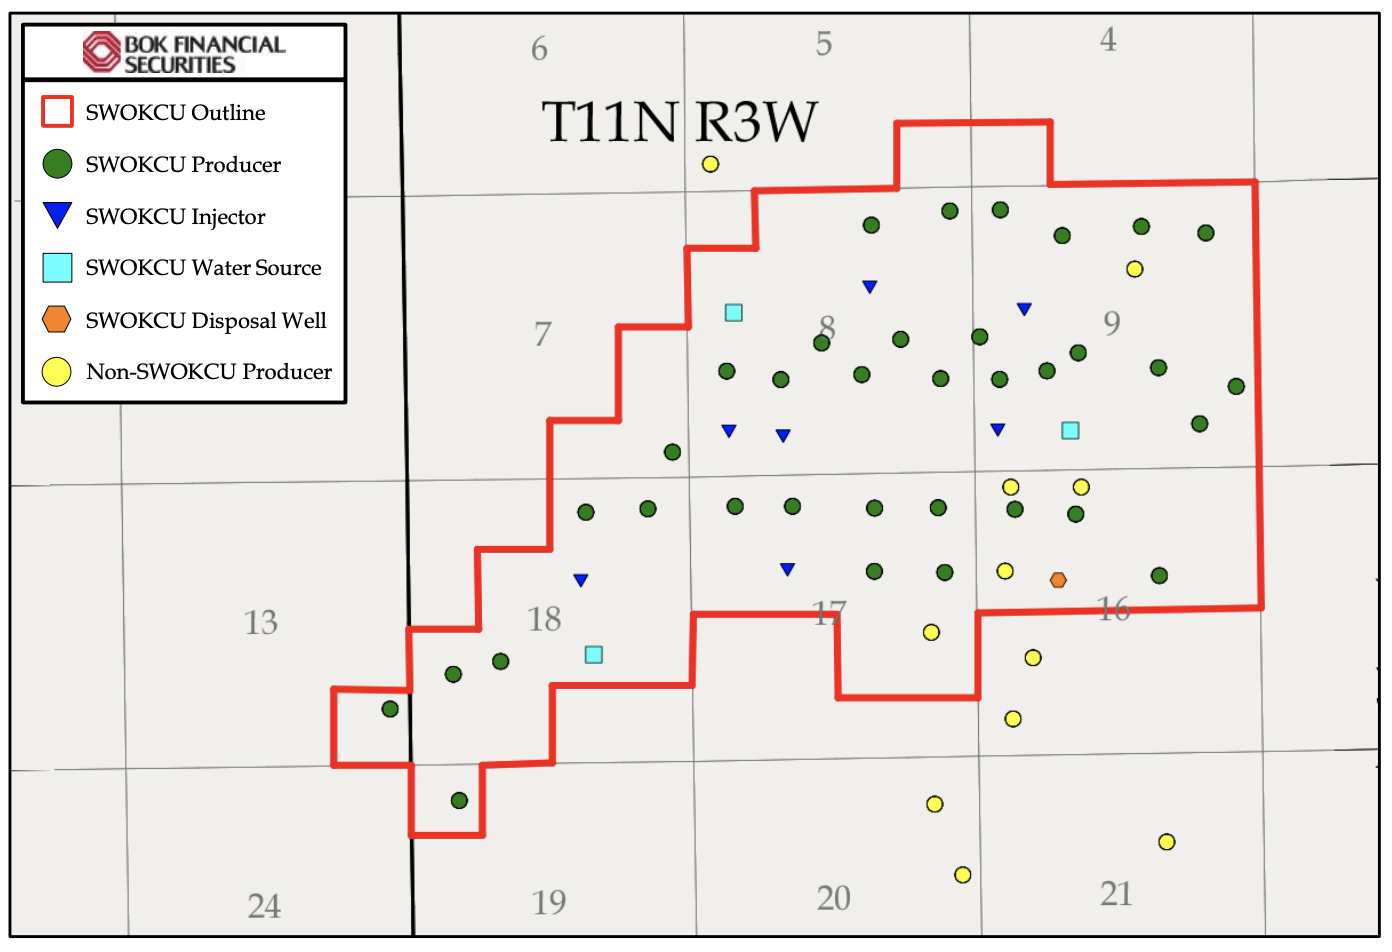 نقشه بازار اوراق بهادار مالی BOK - Properties of Waterflood Water Petroleum Oklahoma